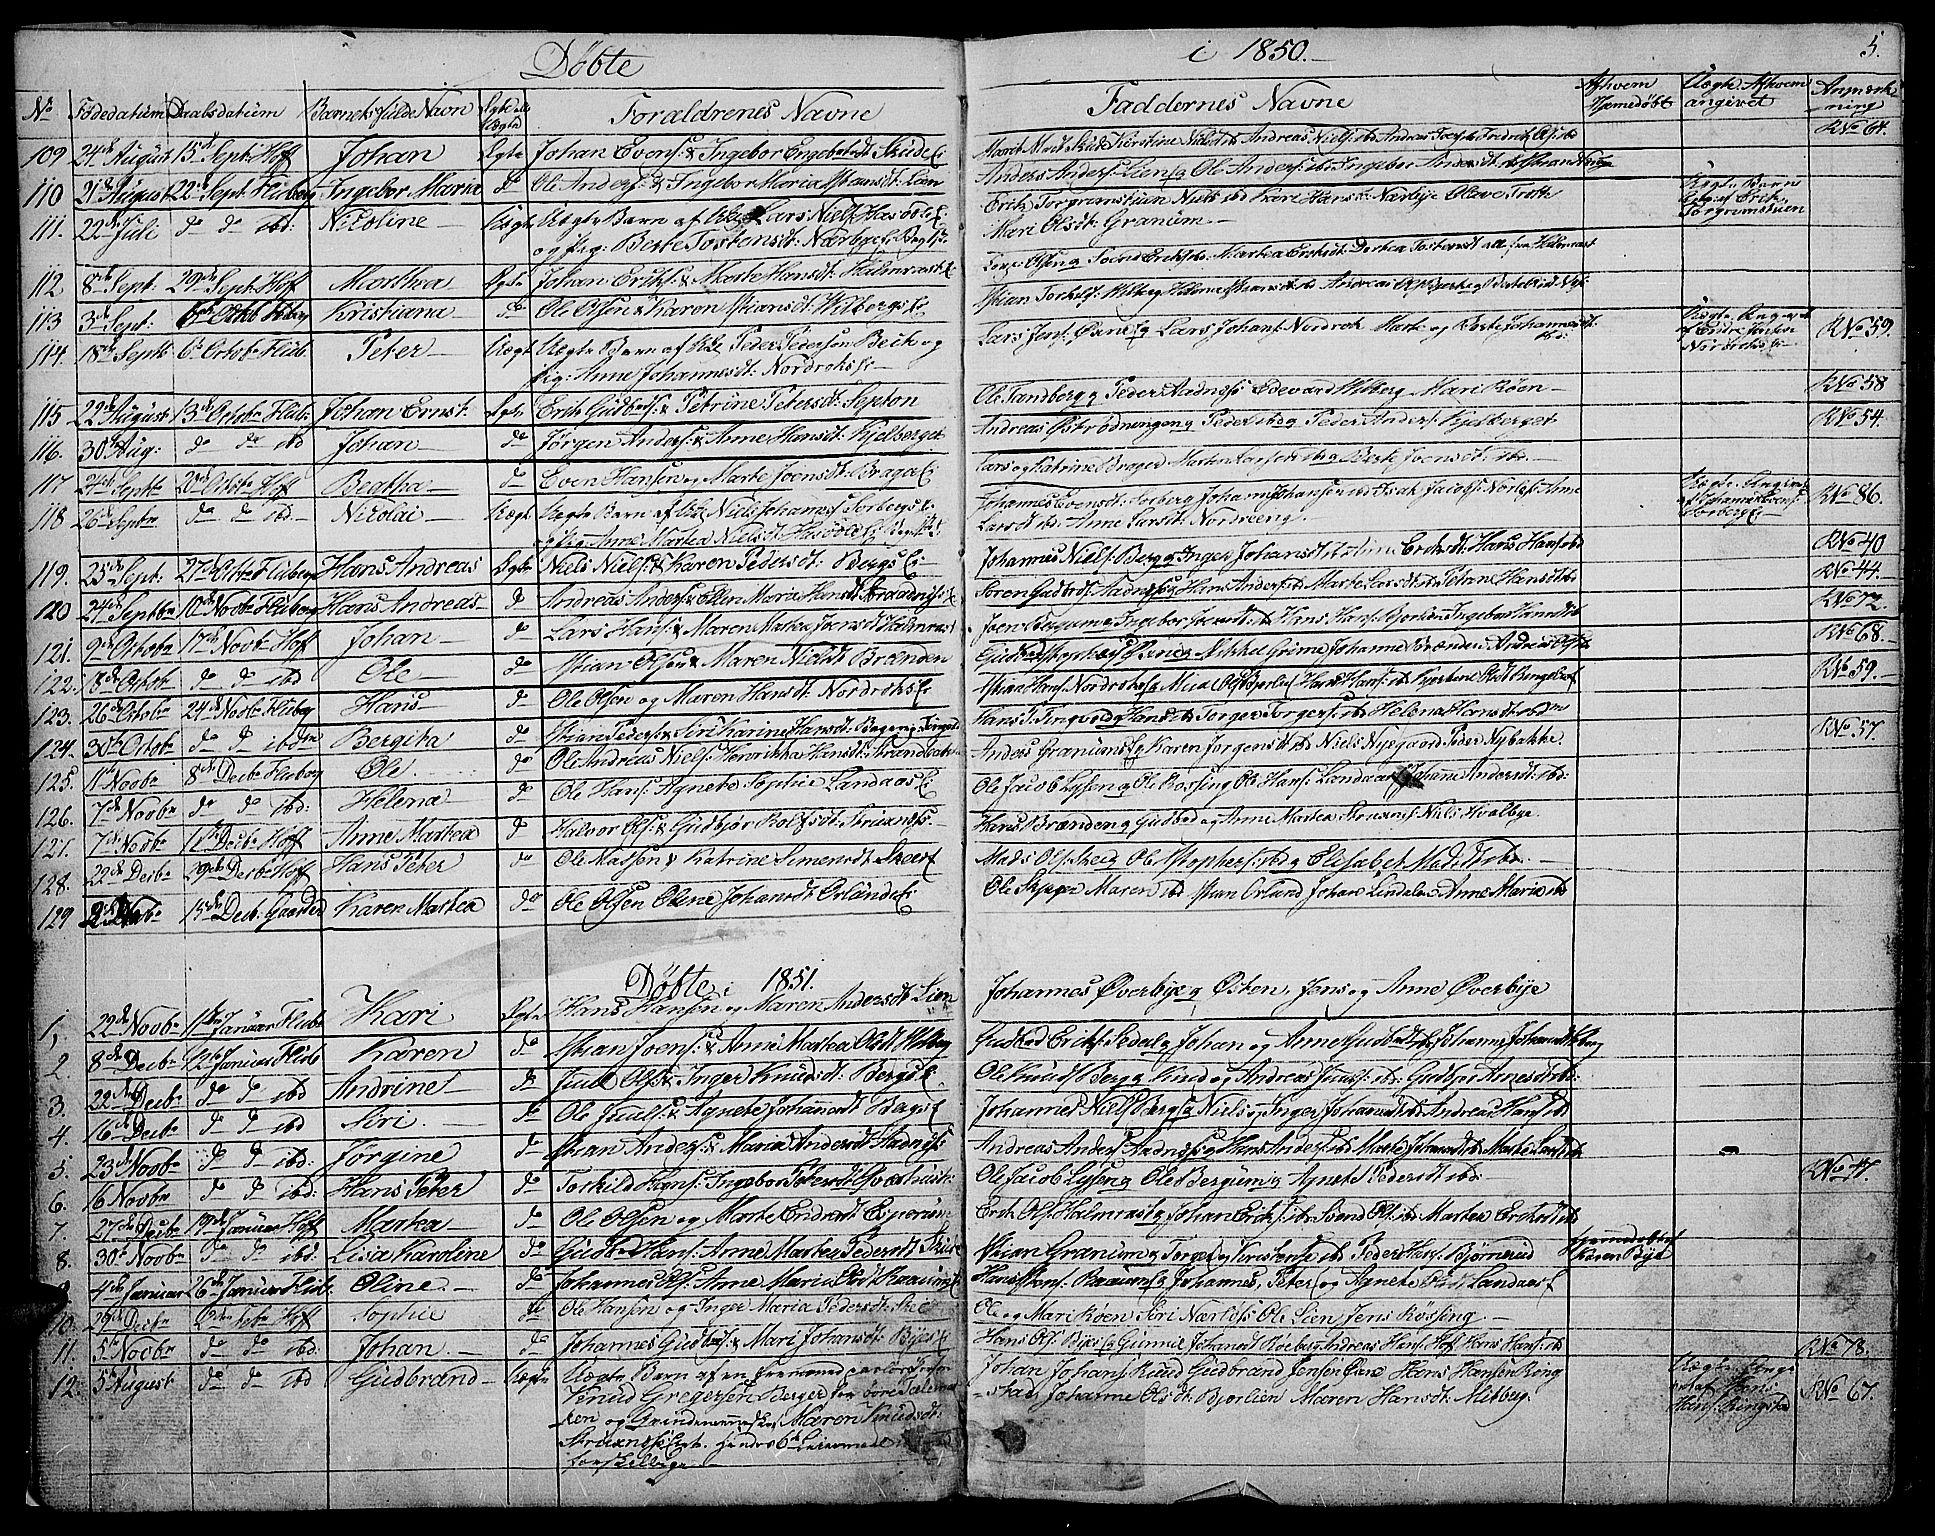 SAH, Søndre Land prestekontor, L/L0001: Klokkerbok nr. 1, 1849-1883, s. 5